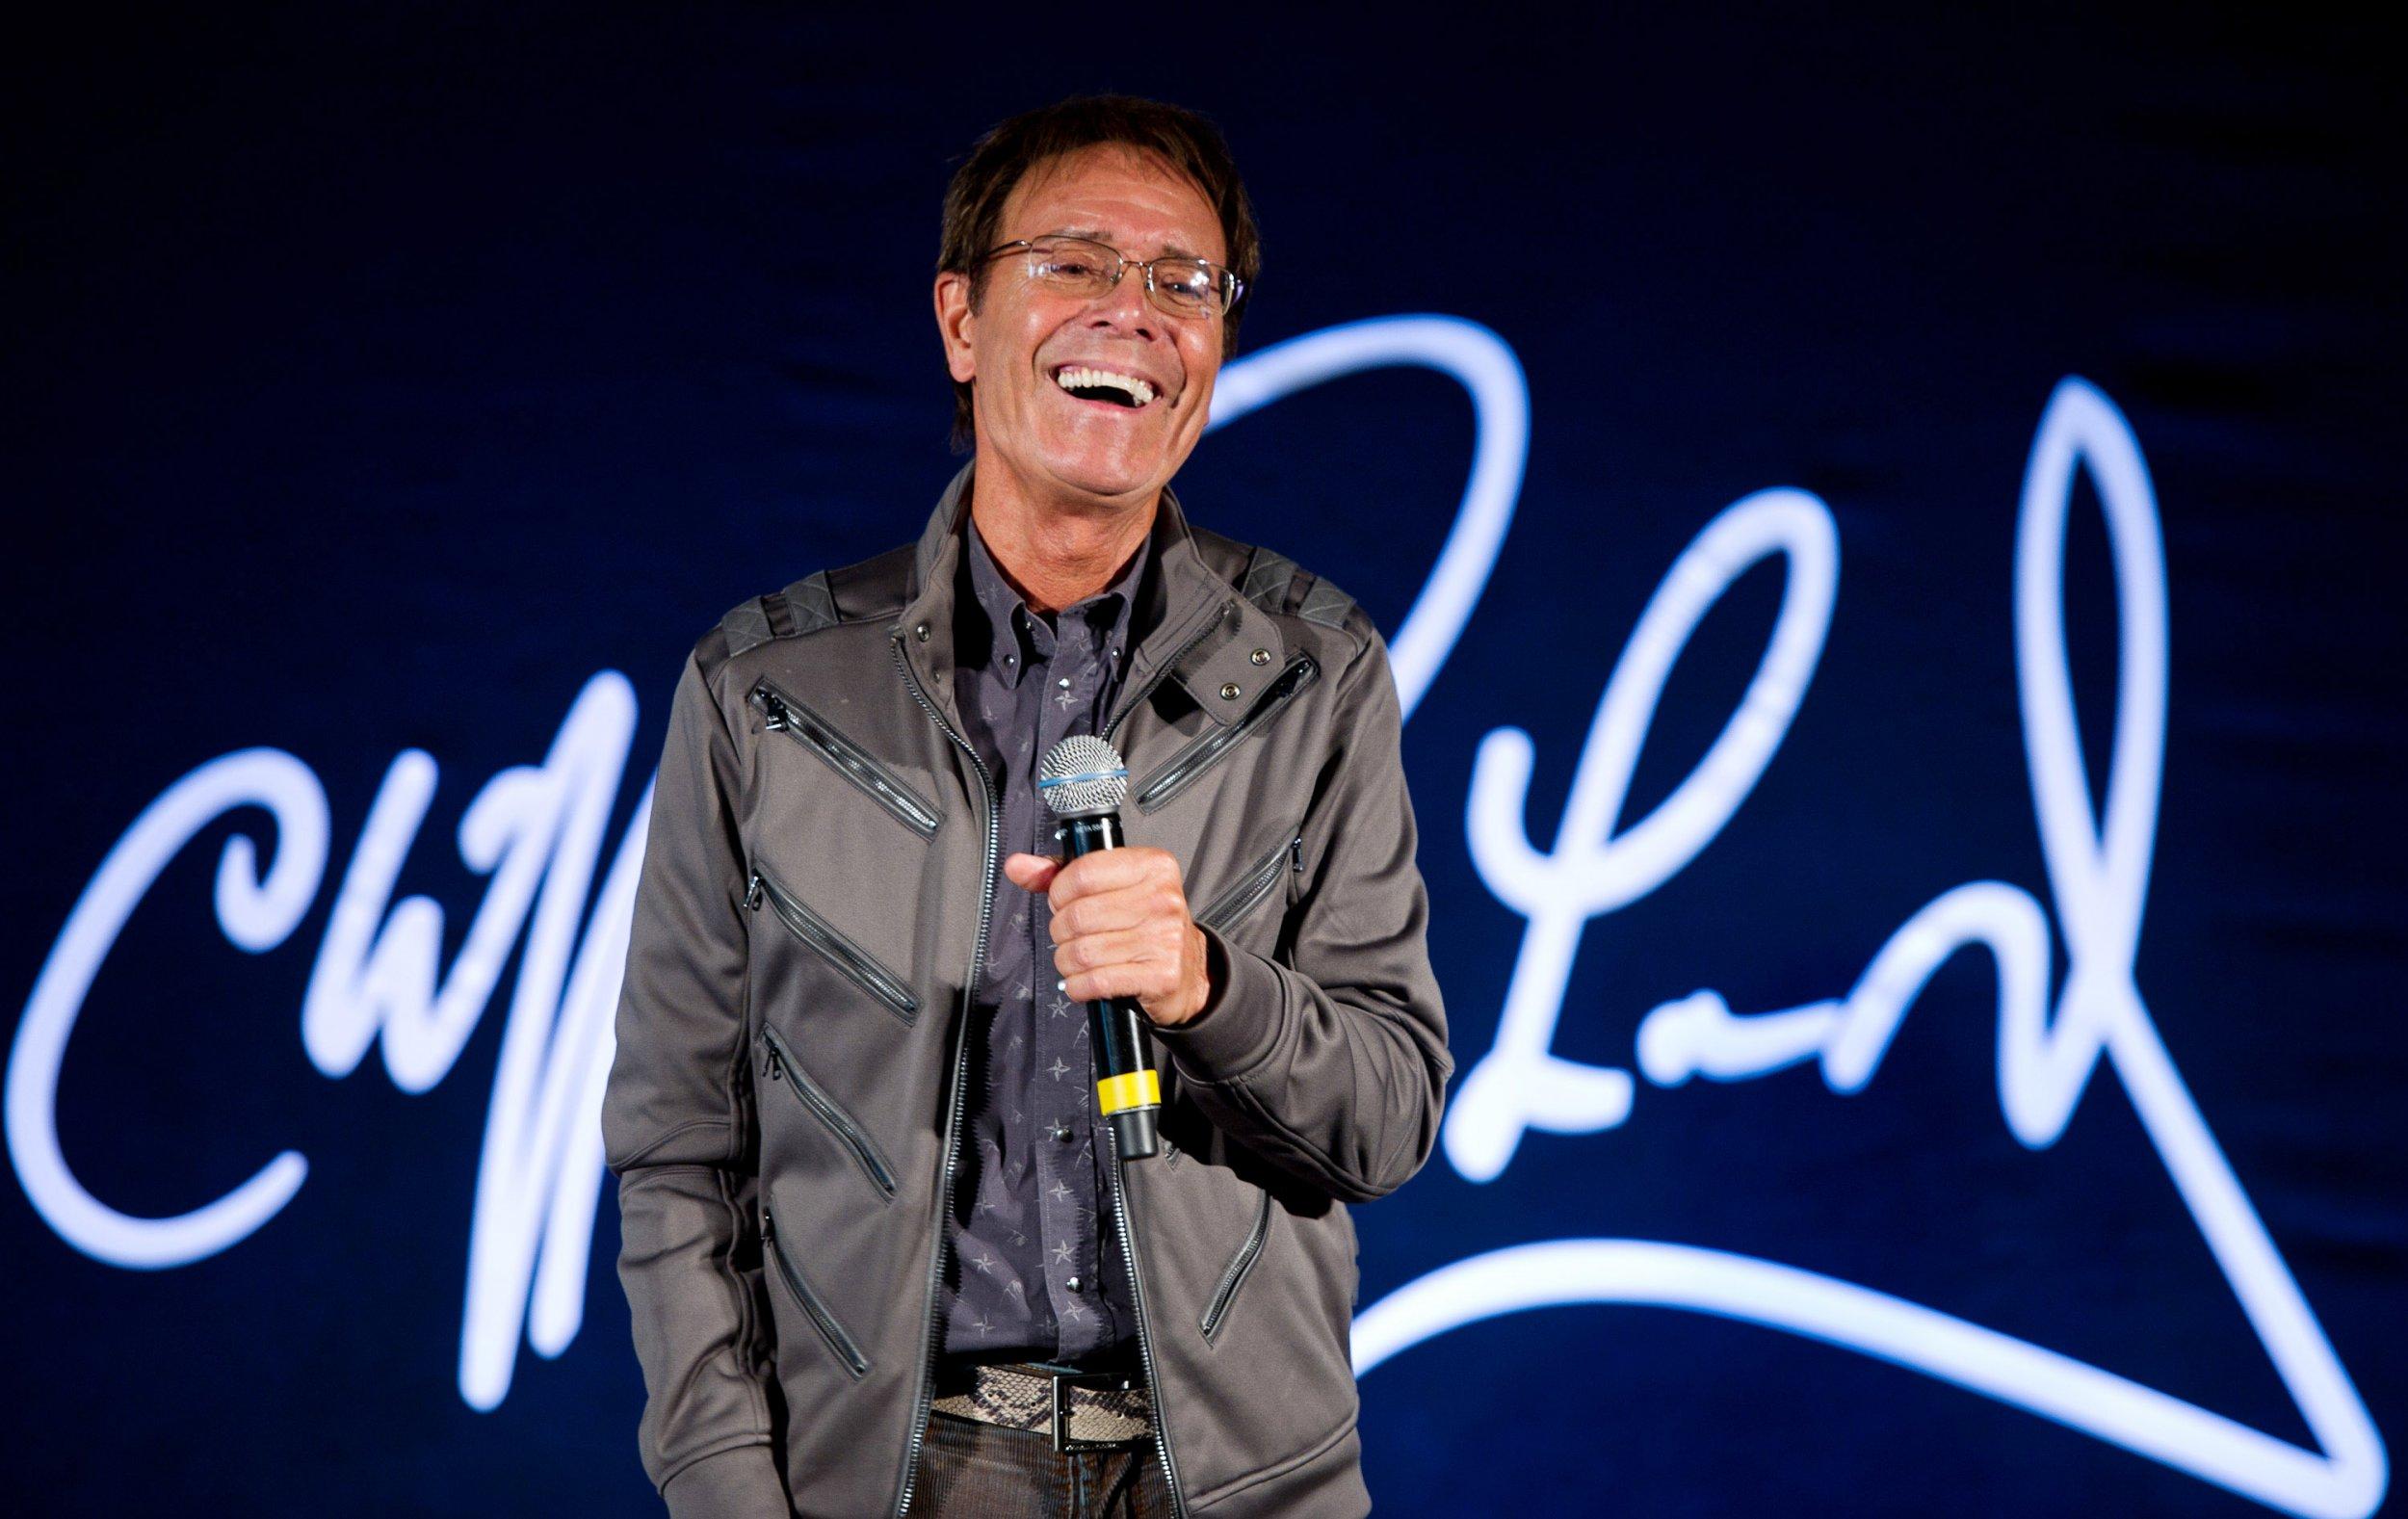 Cliff Richard in 2011